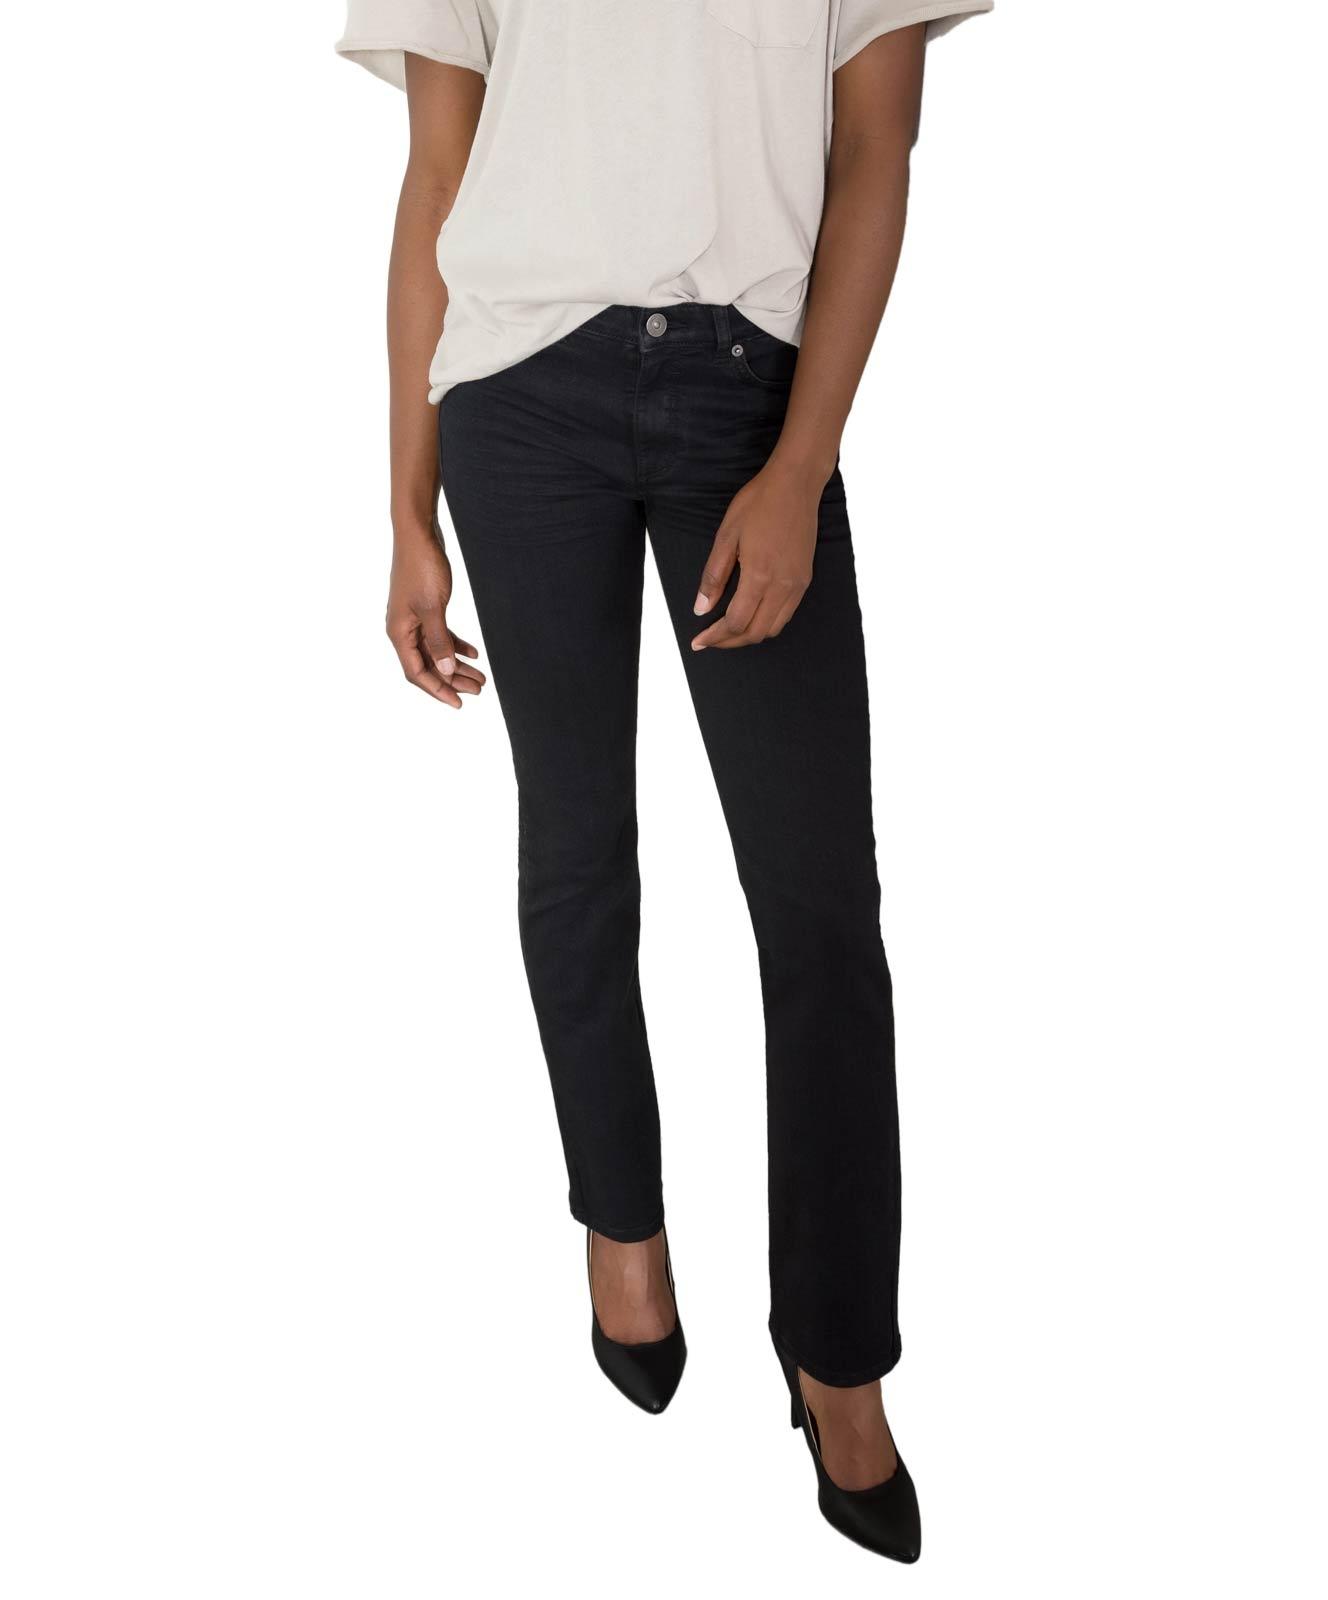 Hosen für Frauen - HIS COLETTA Jeans Straight Fit Pure Black Wash  - Onlineshop Jeans Meile